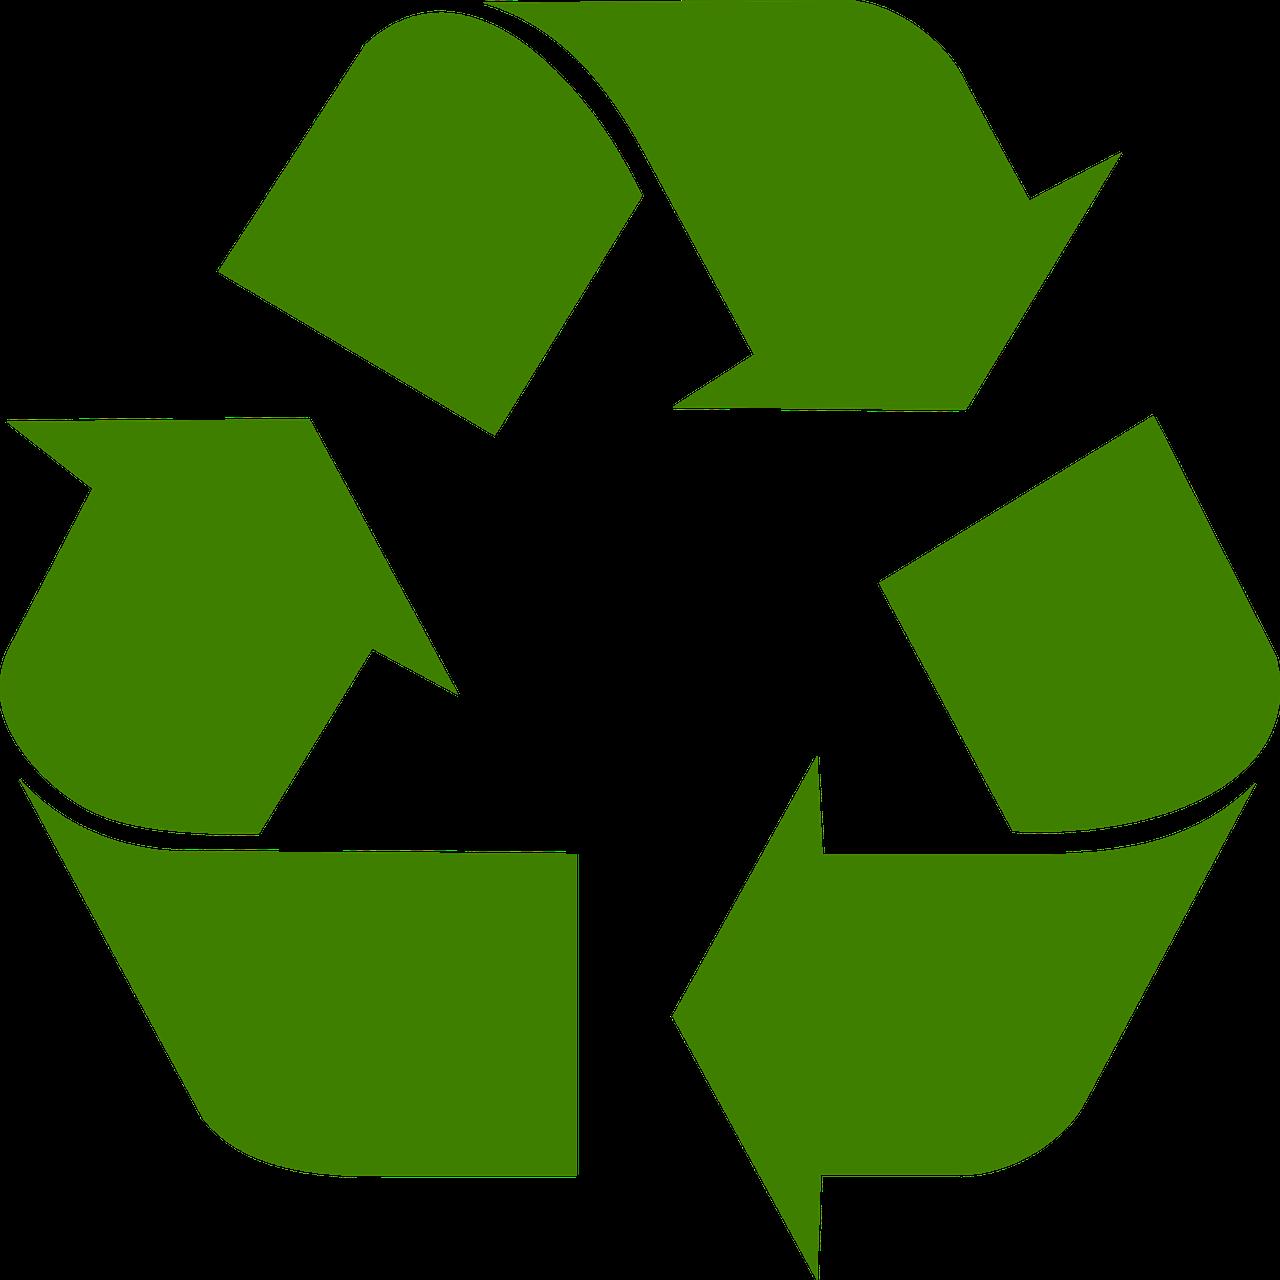 recycling, symbol, logo